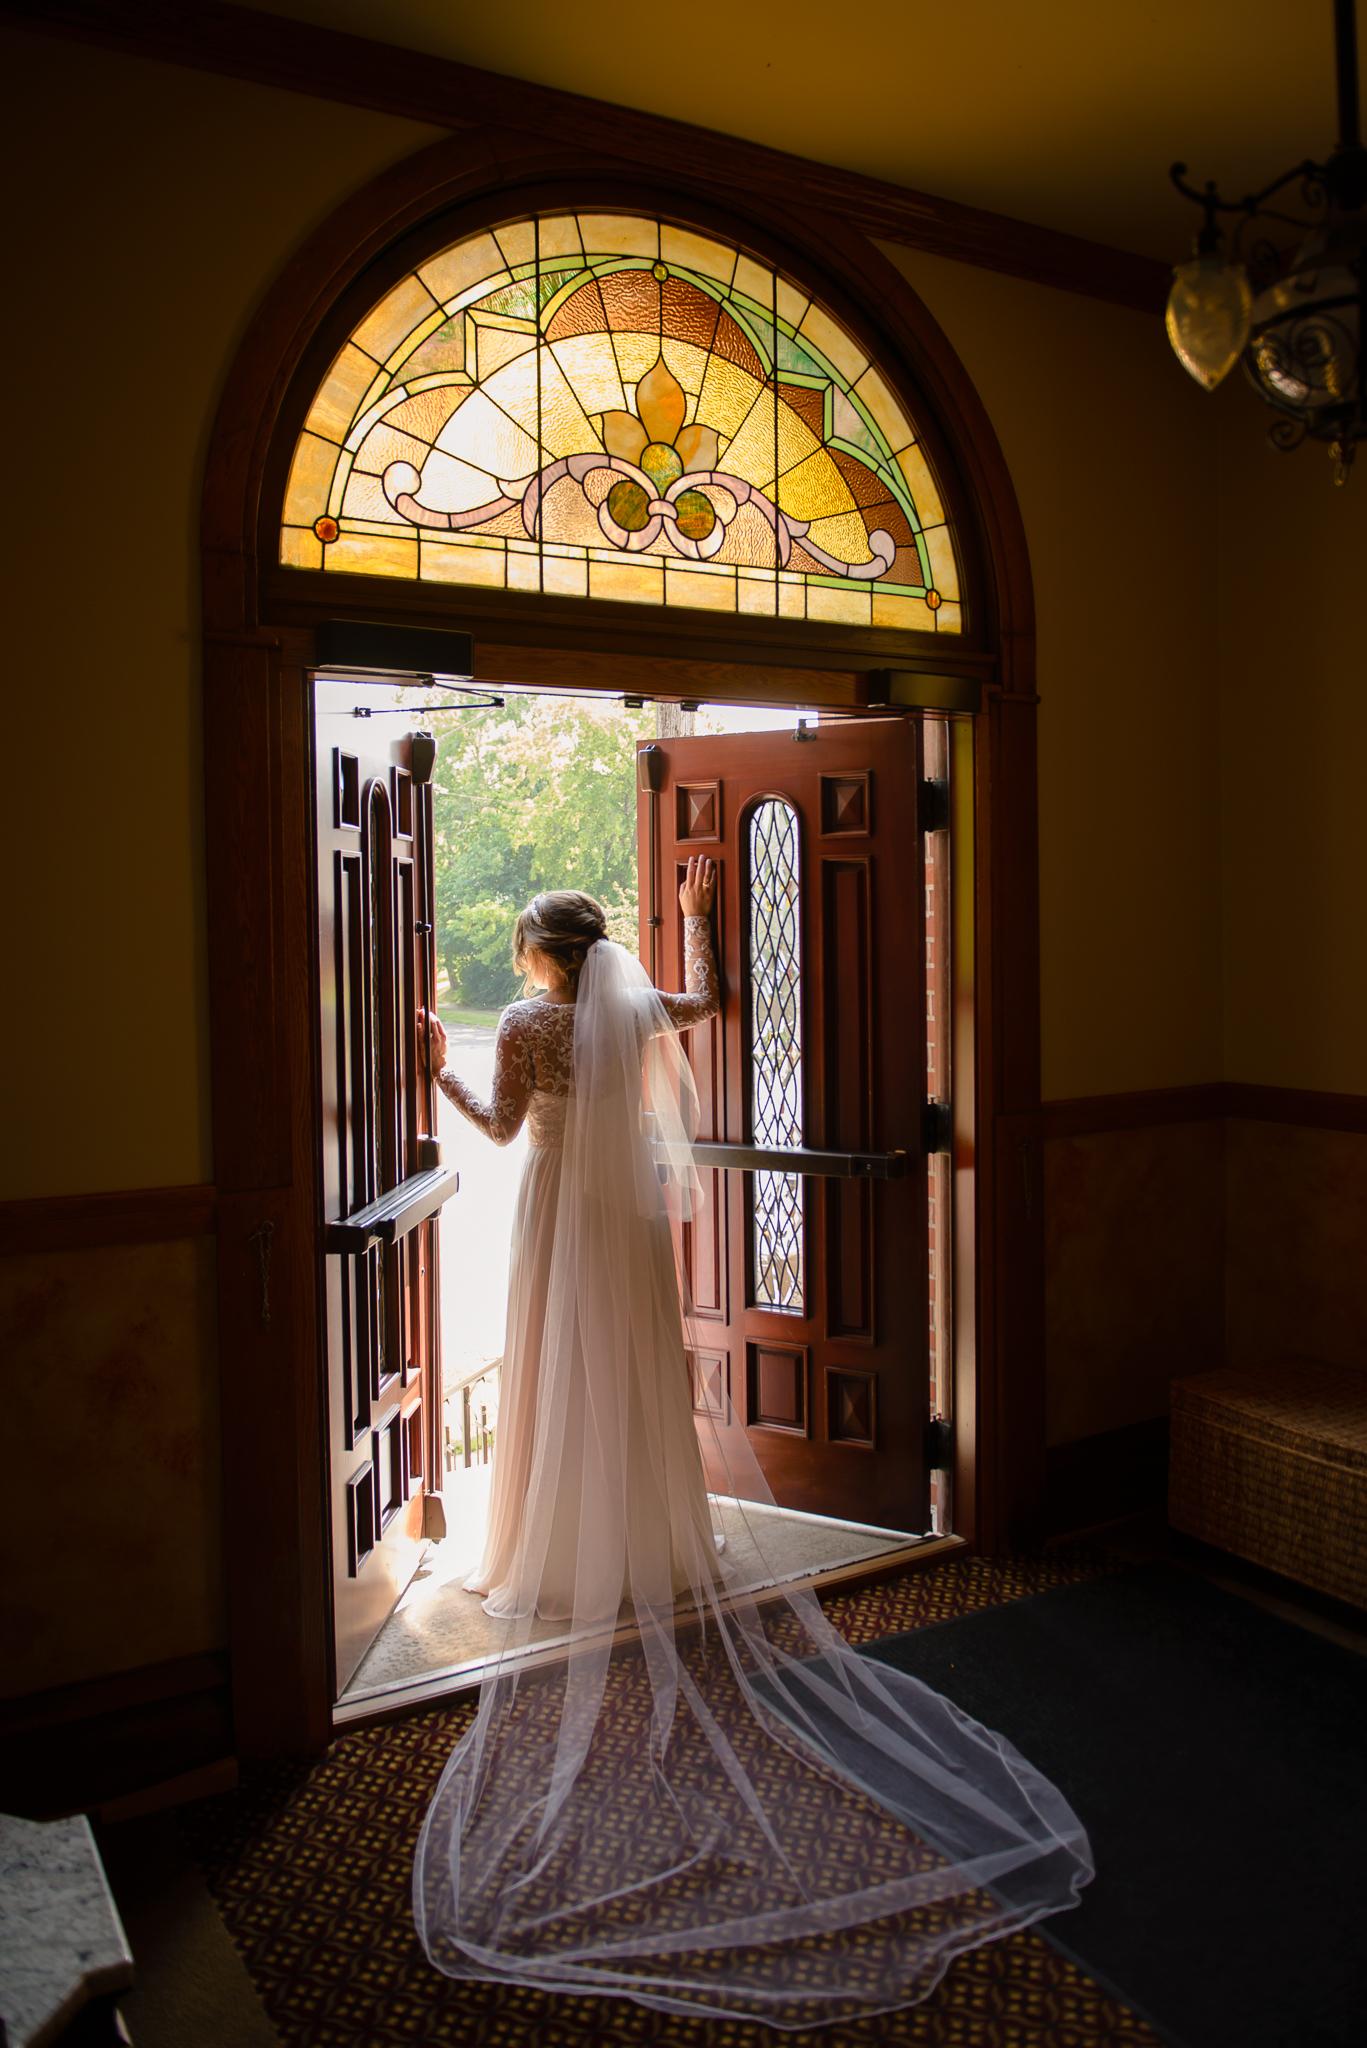 23-ashland washburn wedding photographyDSC_4204.jpg